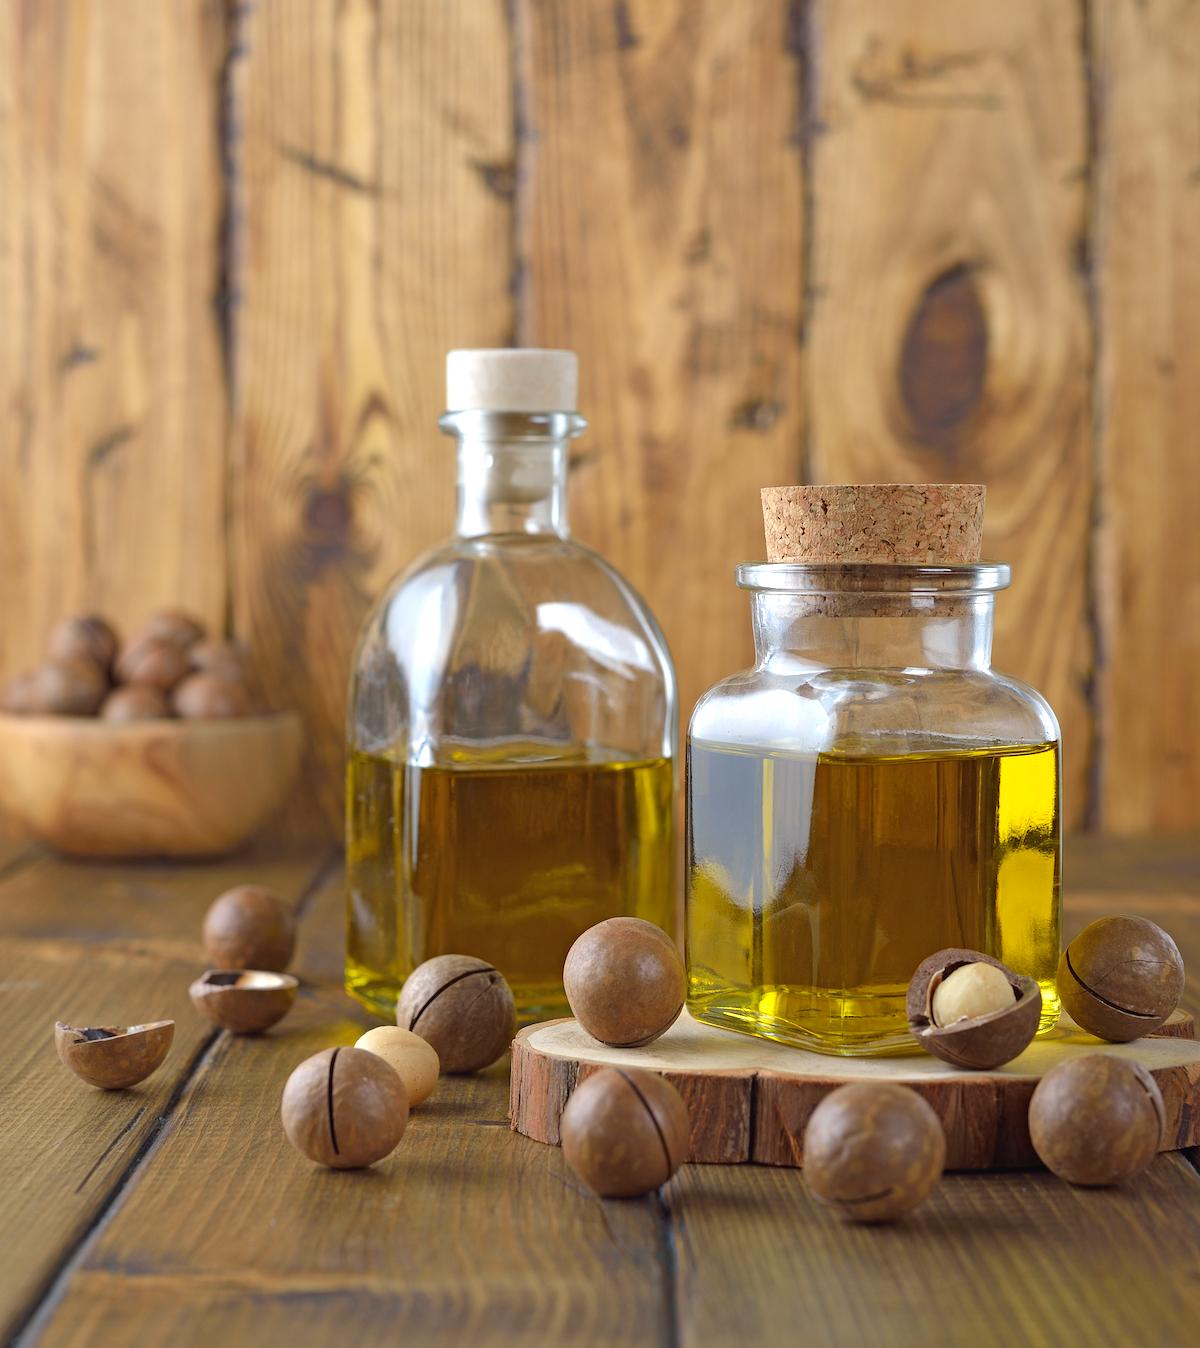 Huile de noix de macadamia ©Olyina V shutterstock